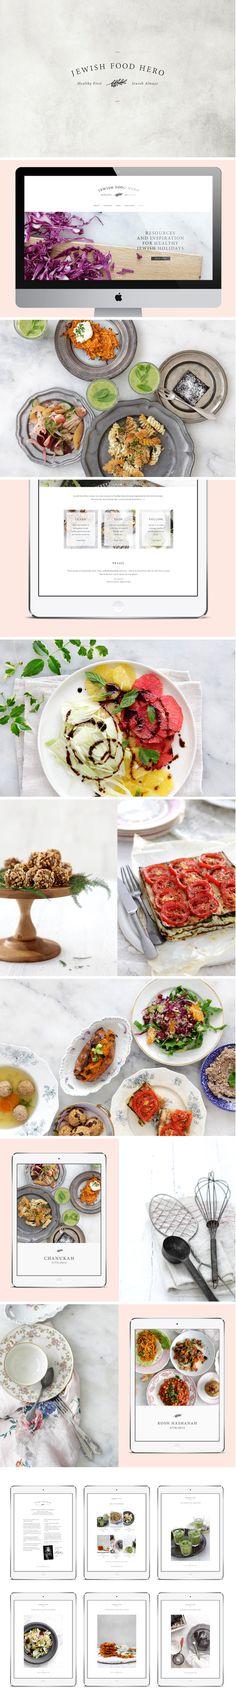 Jewish Food Hero Brand Identity - One Plus One Design #Website #Design #Brand #Identity #BrandIdentity #Branding